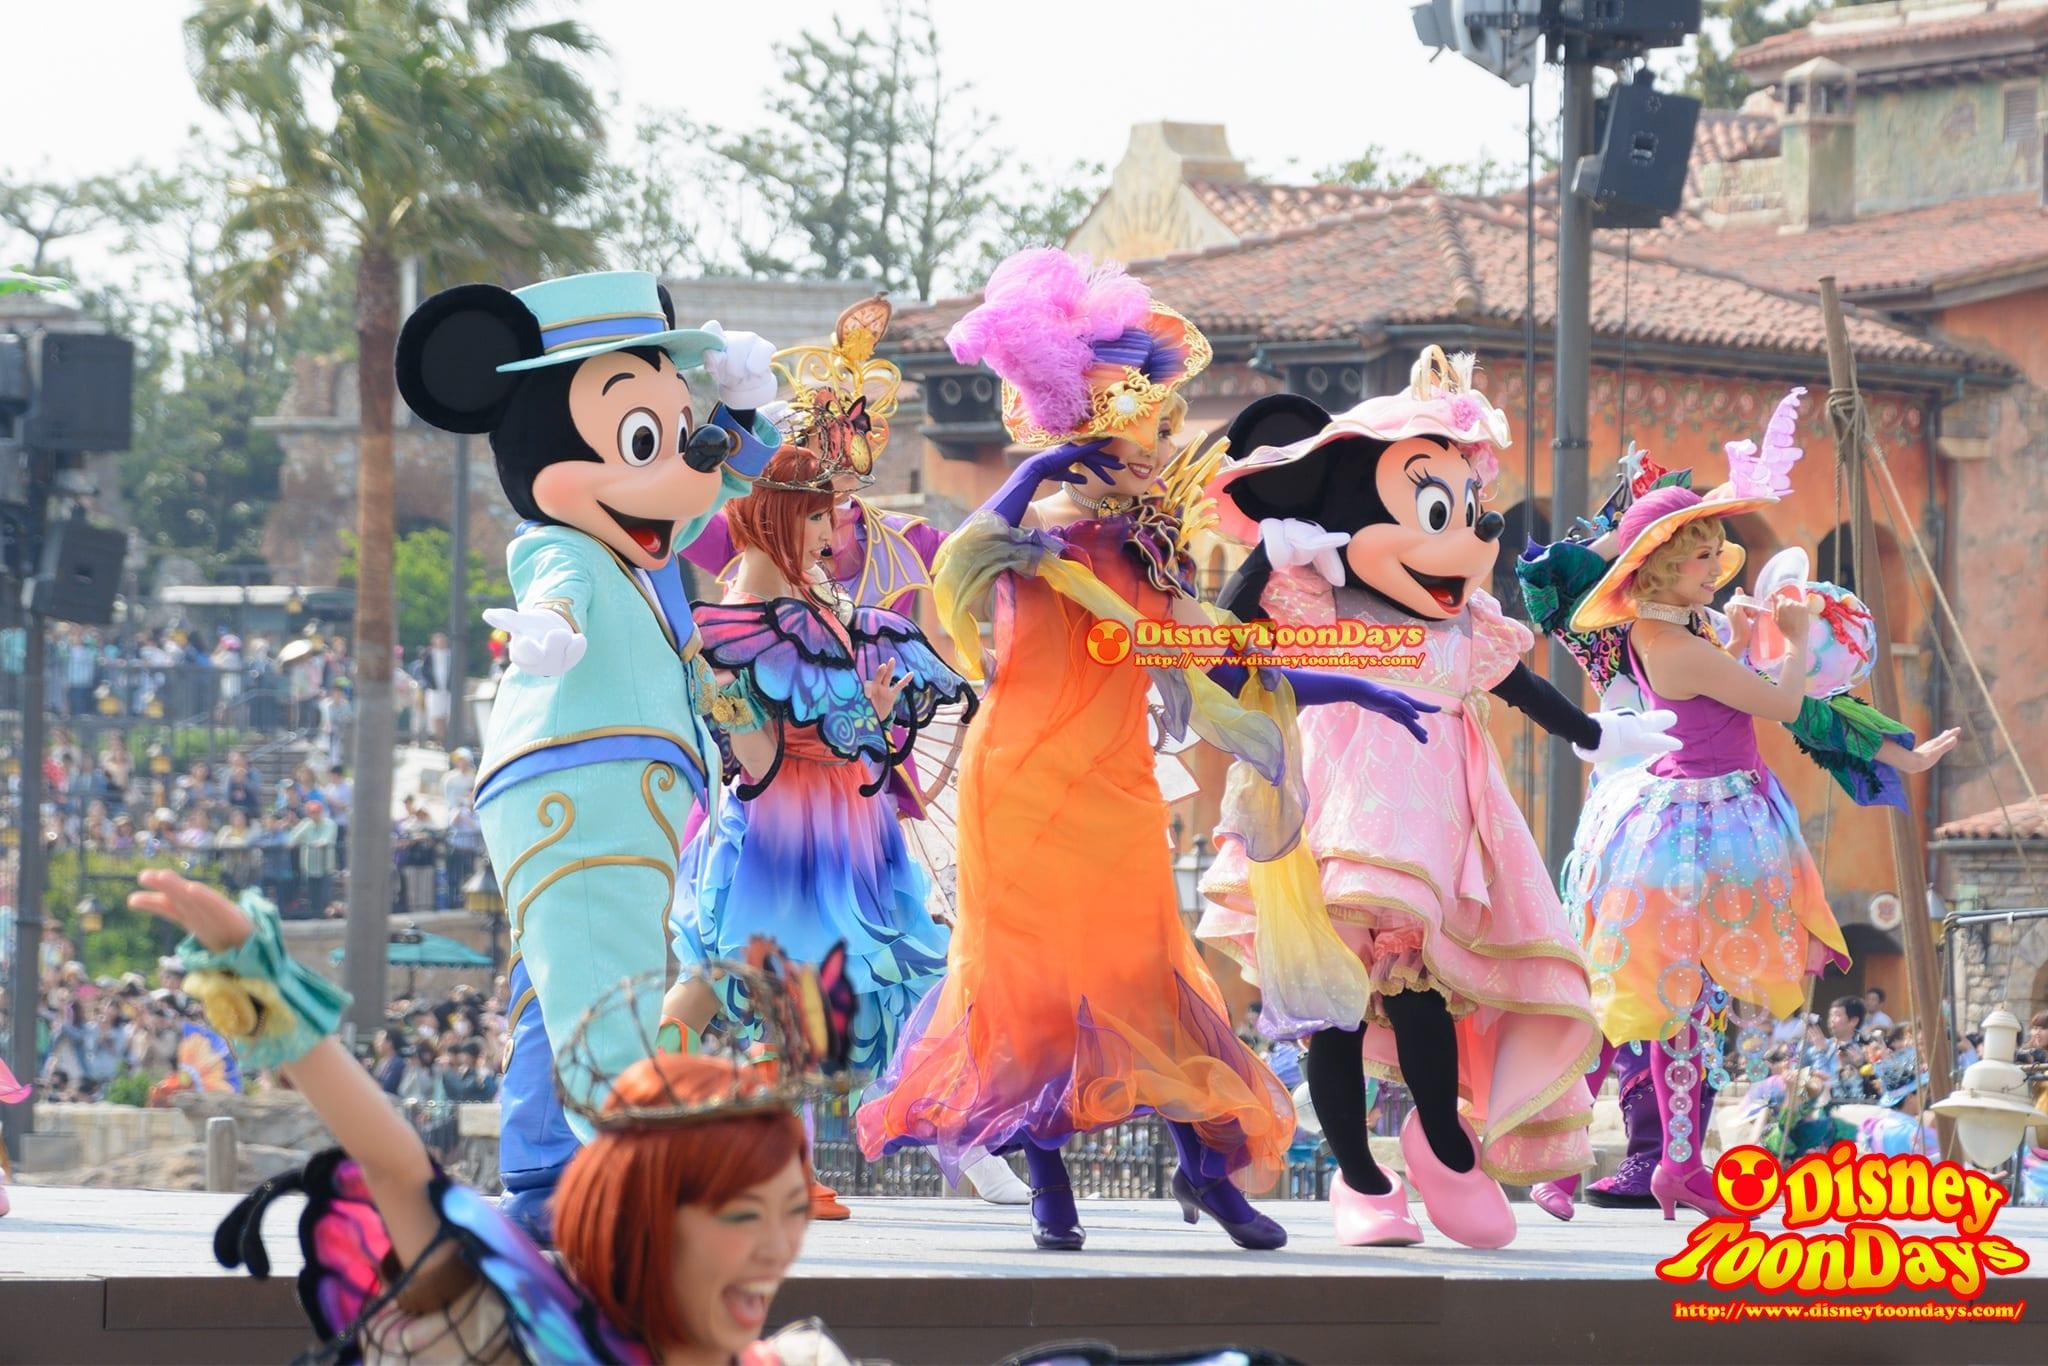 TDS 2015 メディテレーニアンハーバー ディズニー・イースター ファッショナブル・イースター ミッキーマウス ミニーマウス グローリエ・デ・モード